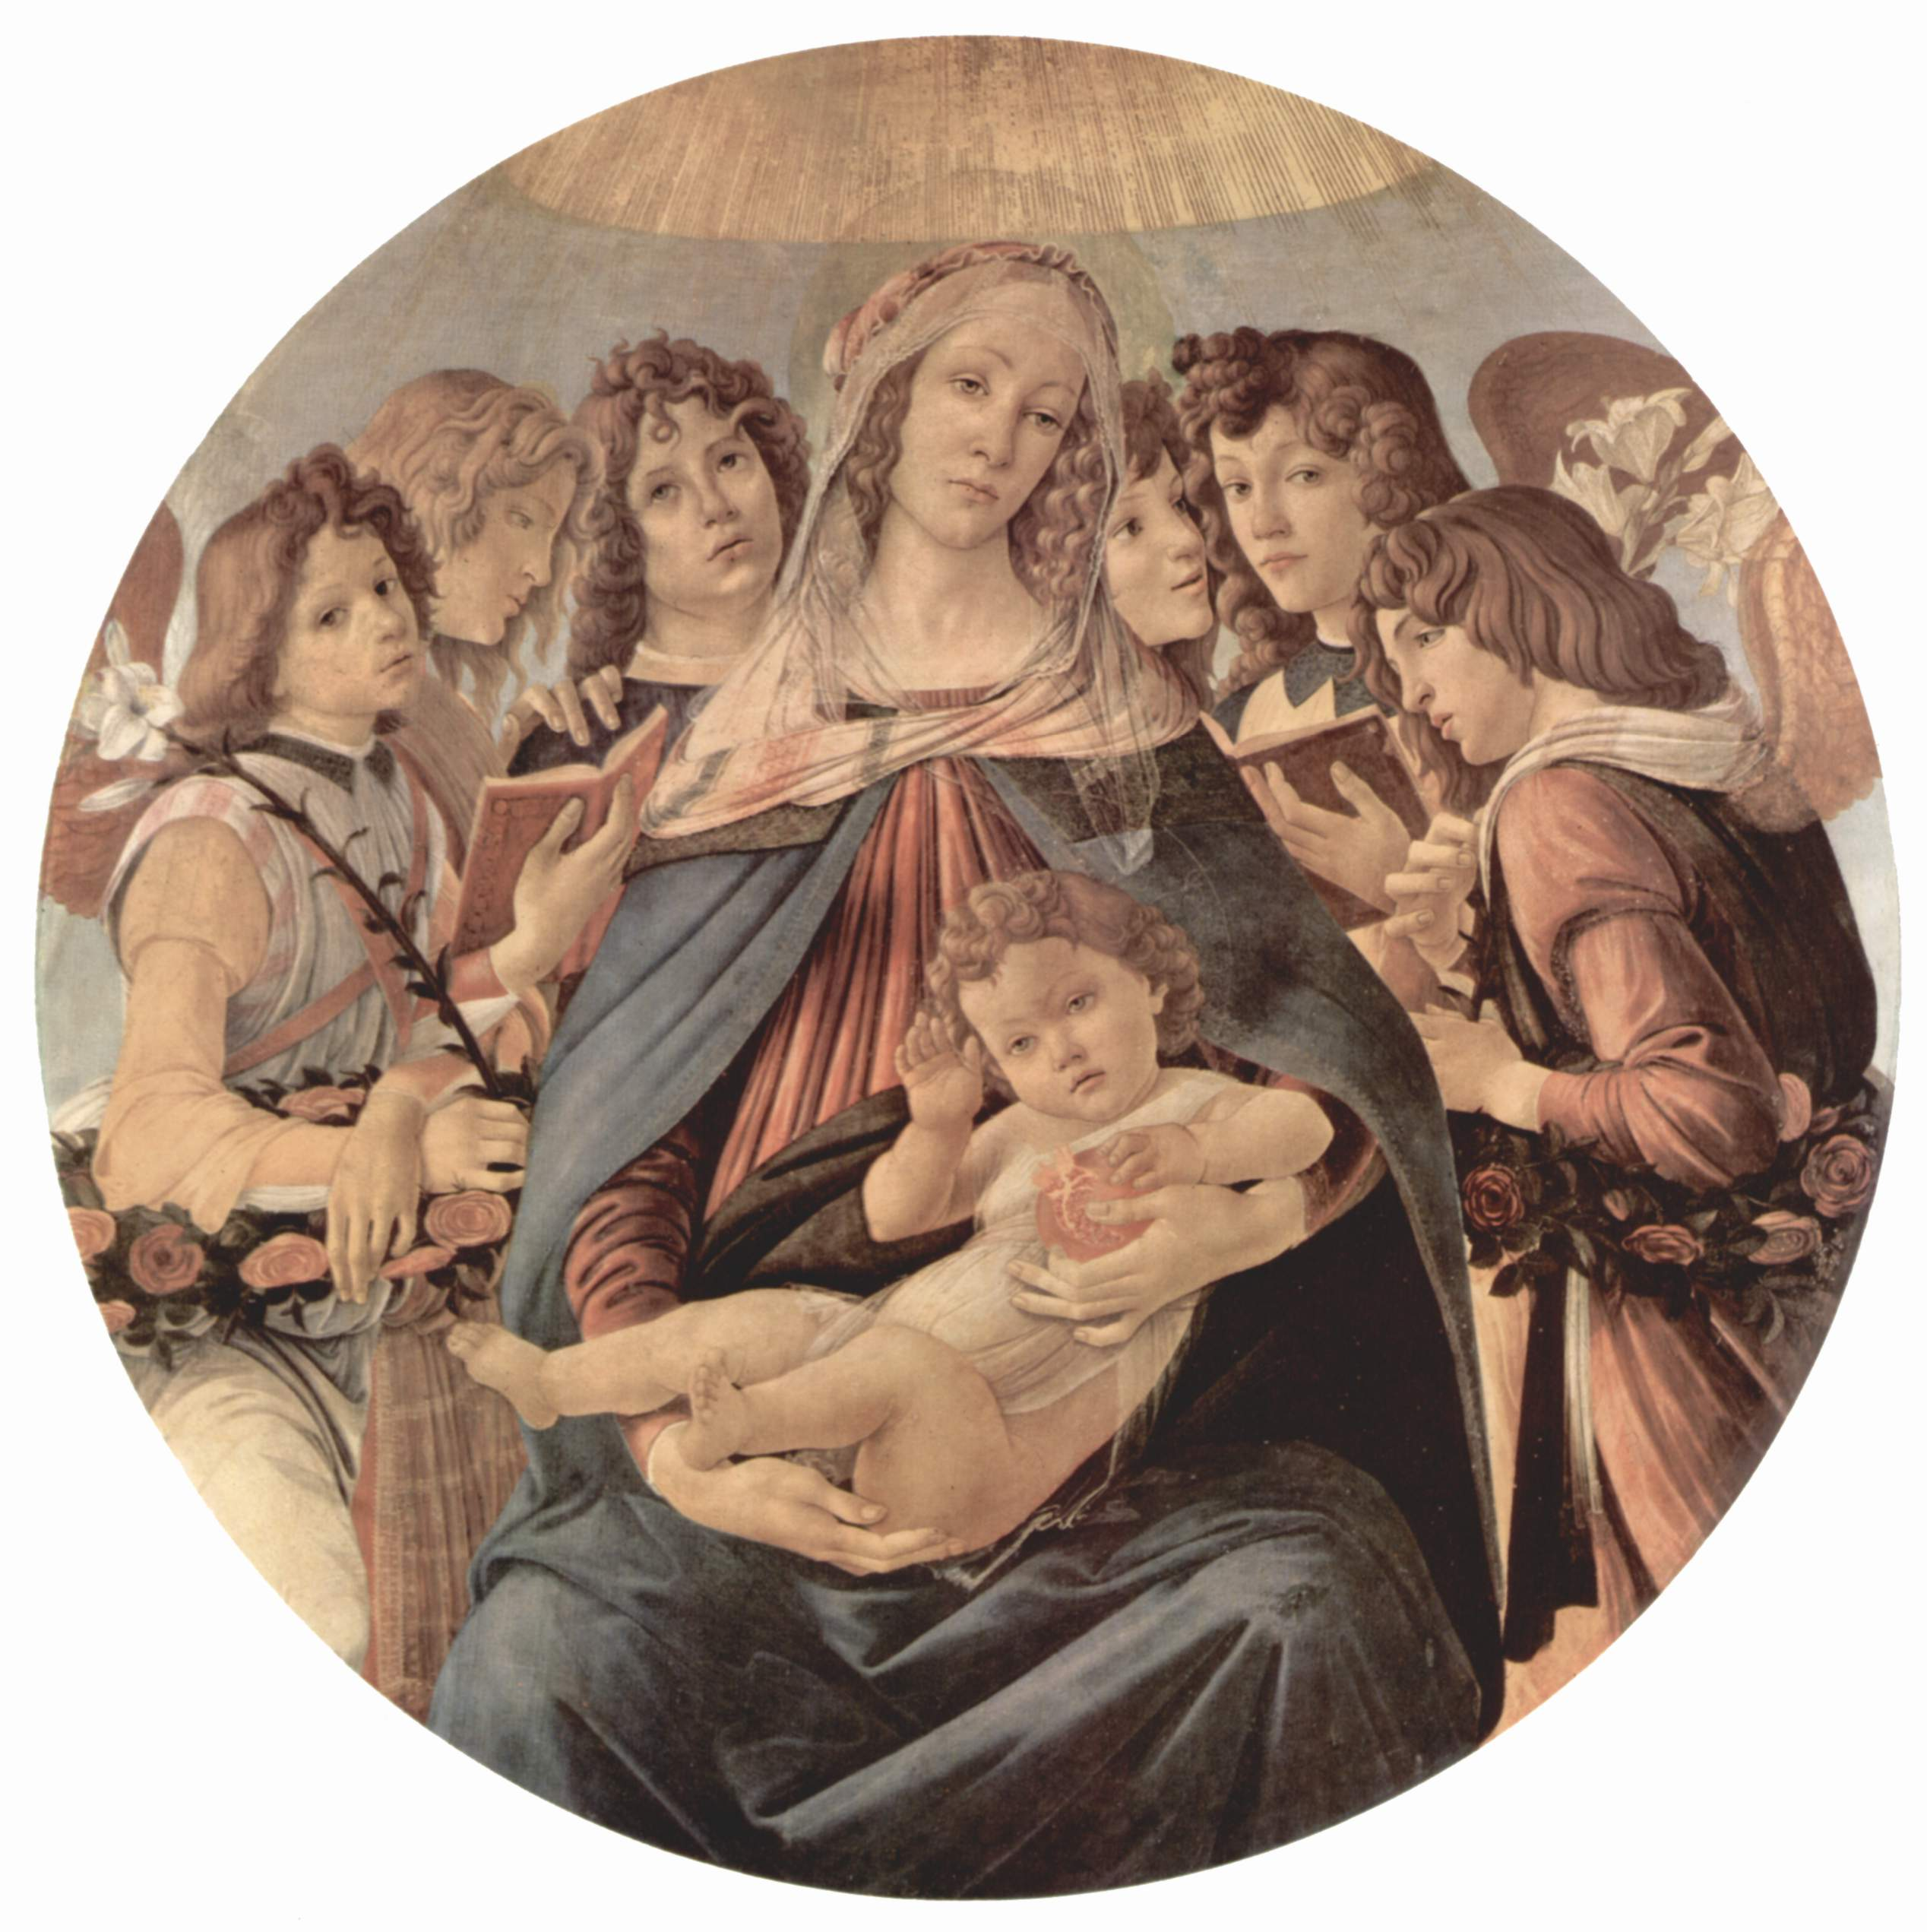 http://upload.wikimedia.org/wikipedia/commons/c/c5/Sandro_Botticelli_060.jpg